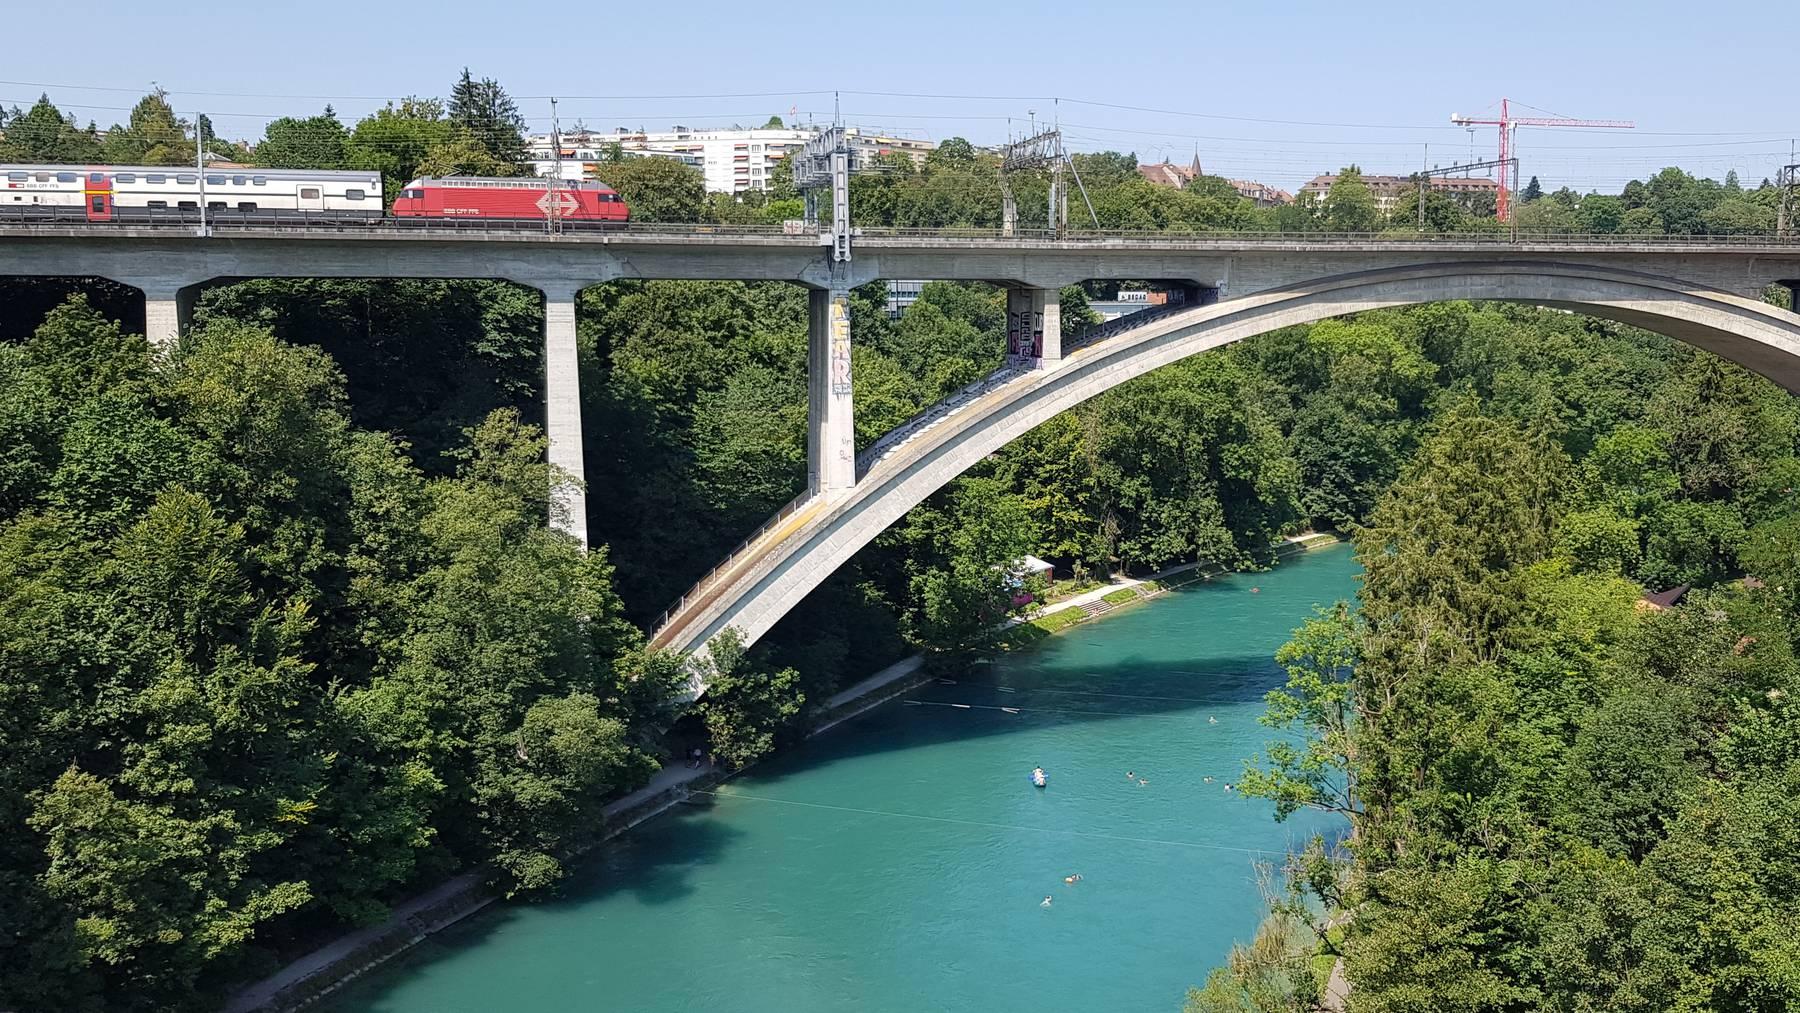 Bern_Aare_Baden_SBB_Brücke_rb1